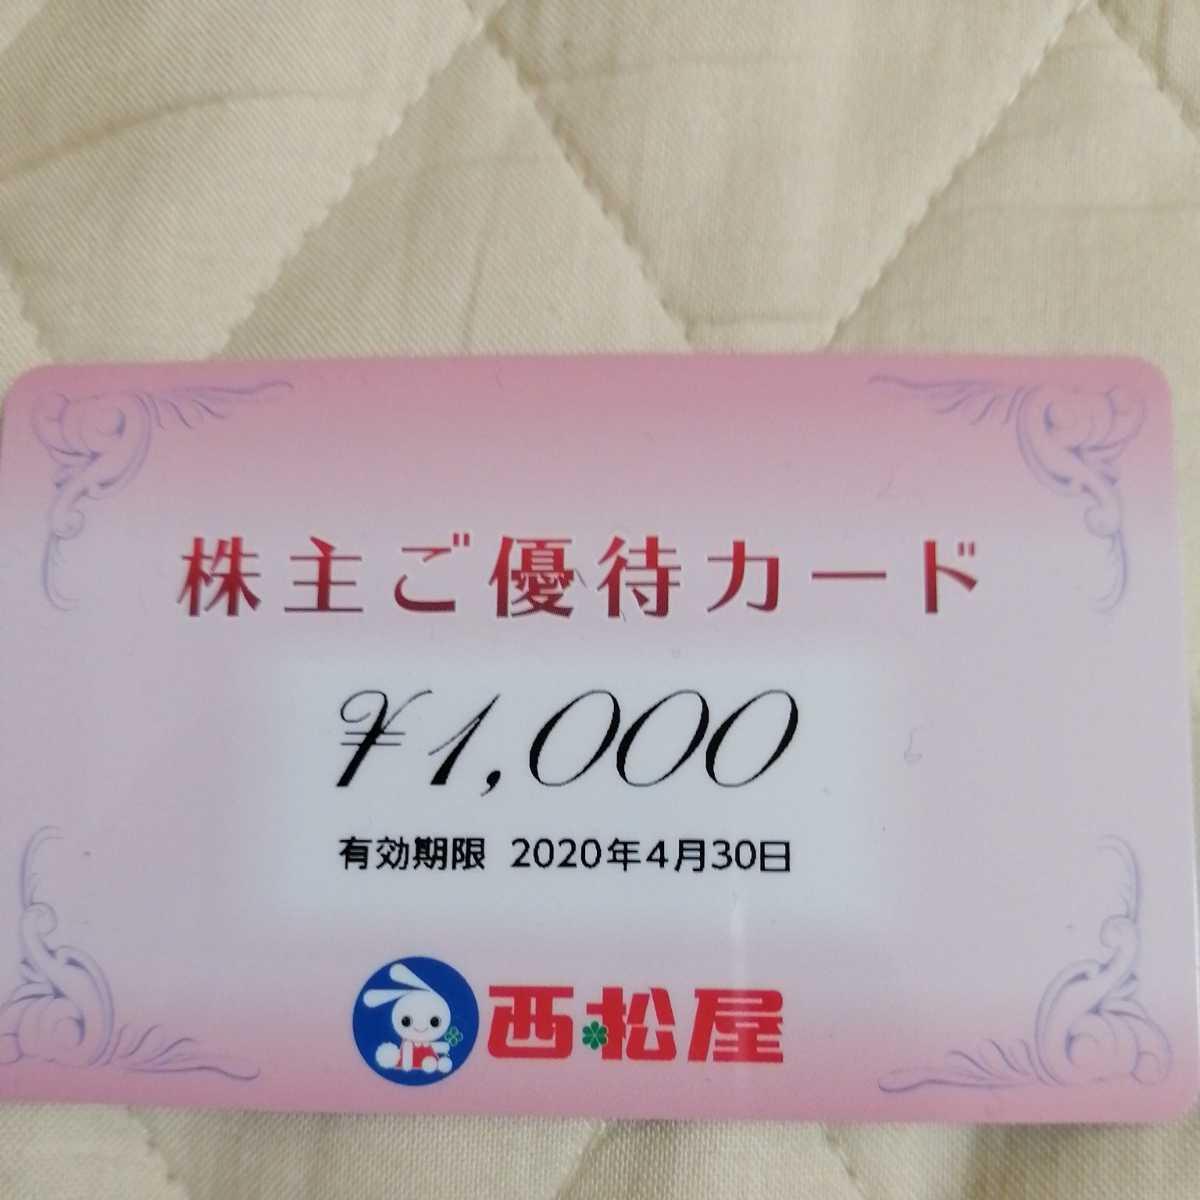 西松屋 株主優待カード1,000円分